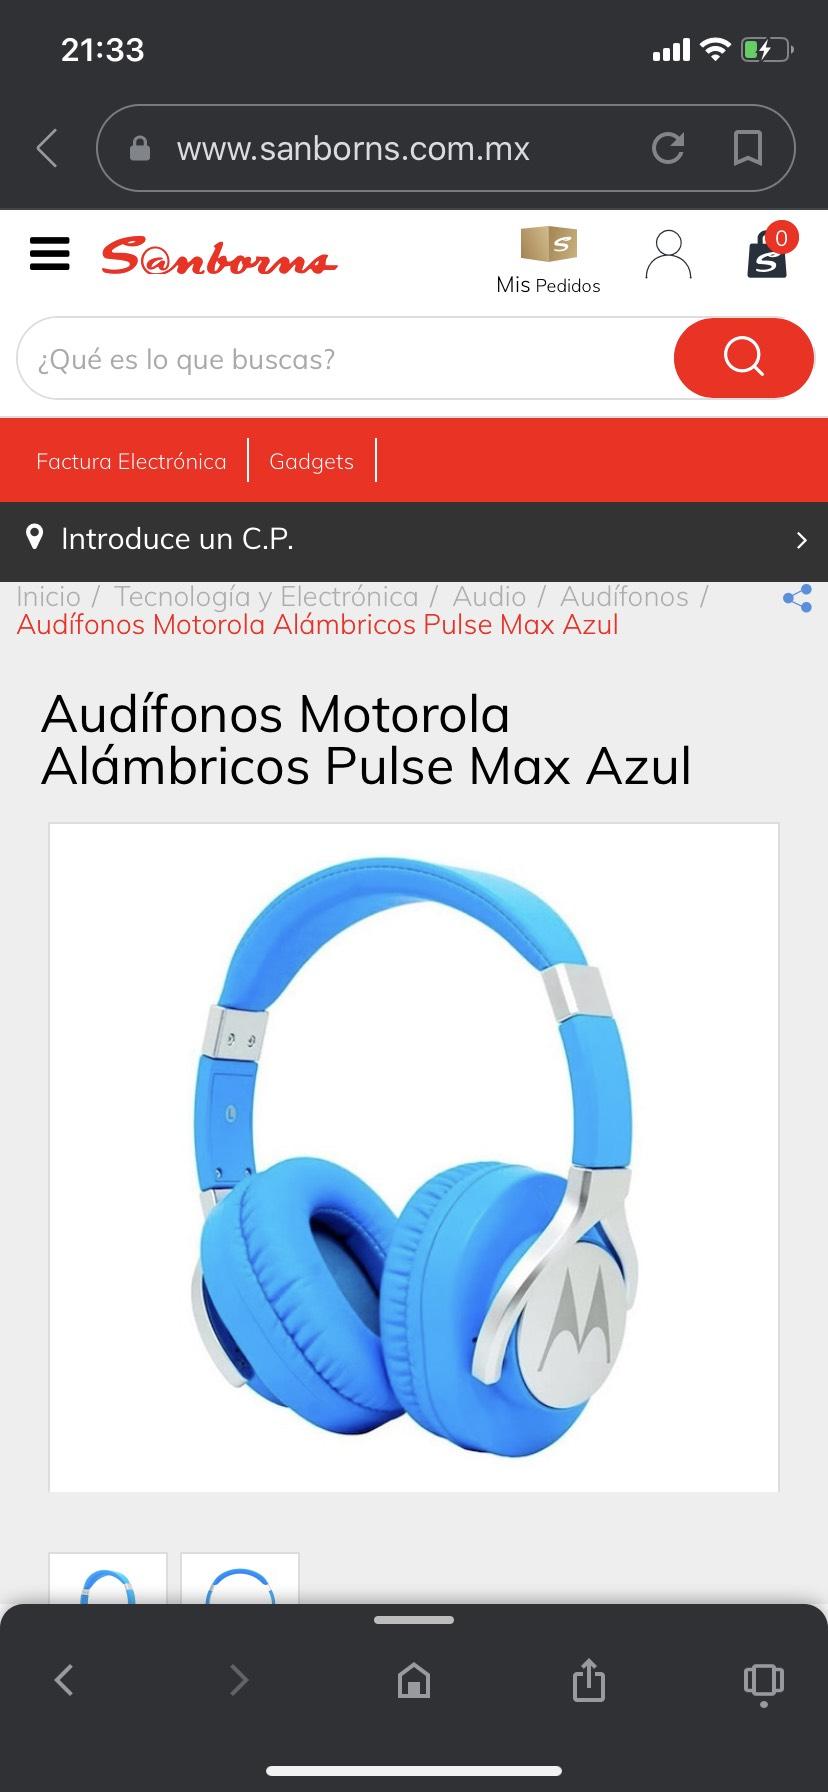 Sanborns: Audífonos Motorola Alámbricos Pulse Max Azul